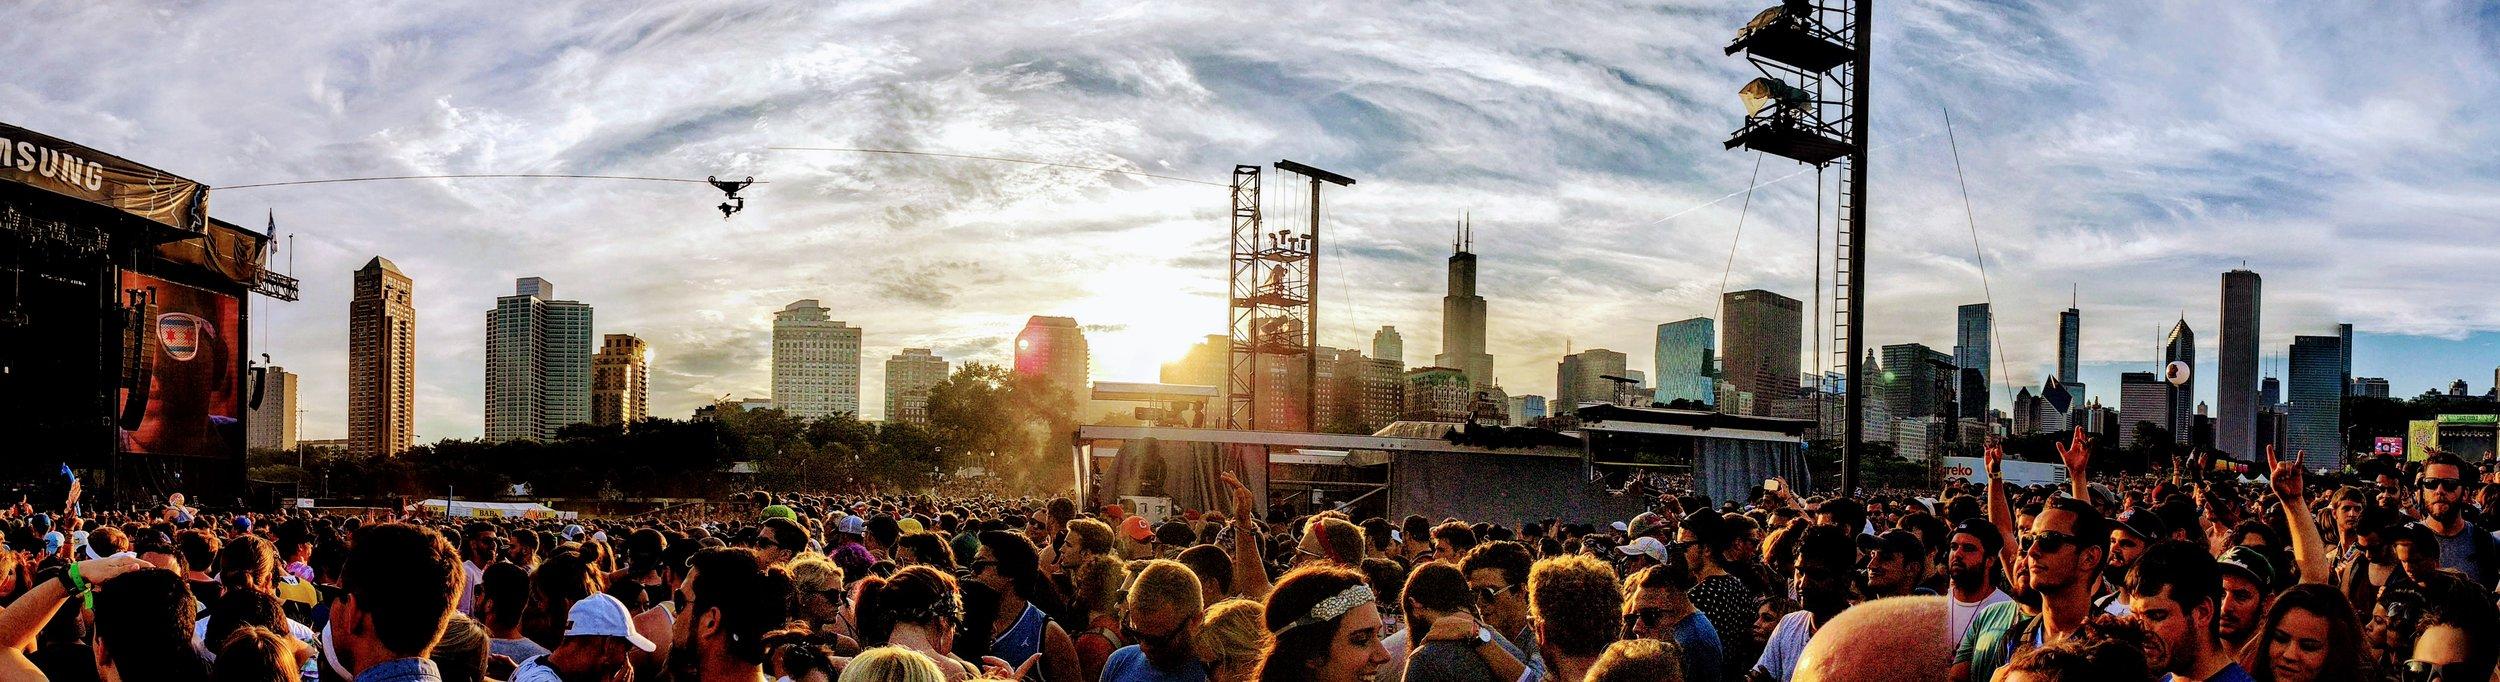 Lollapalooza 2016 | @thefaakehipster